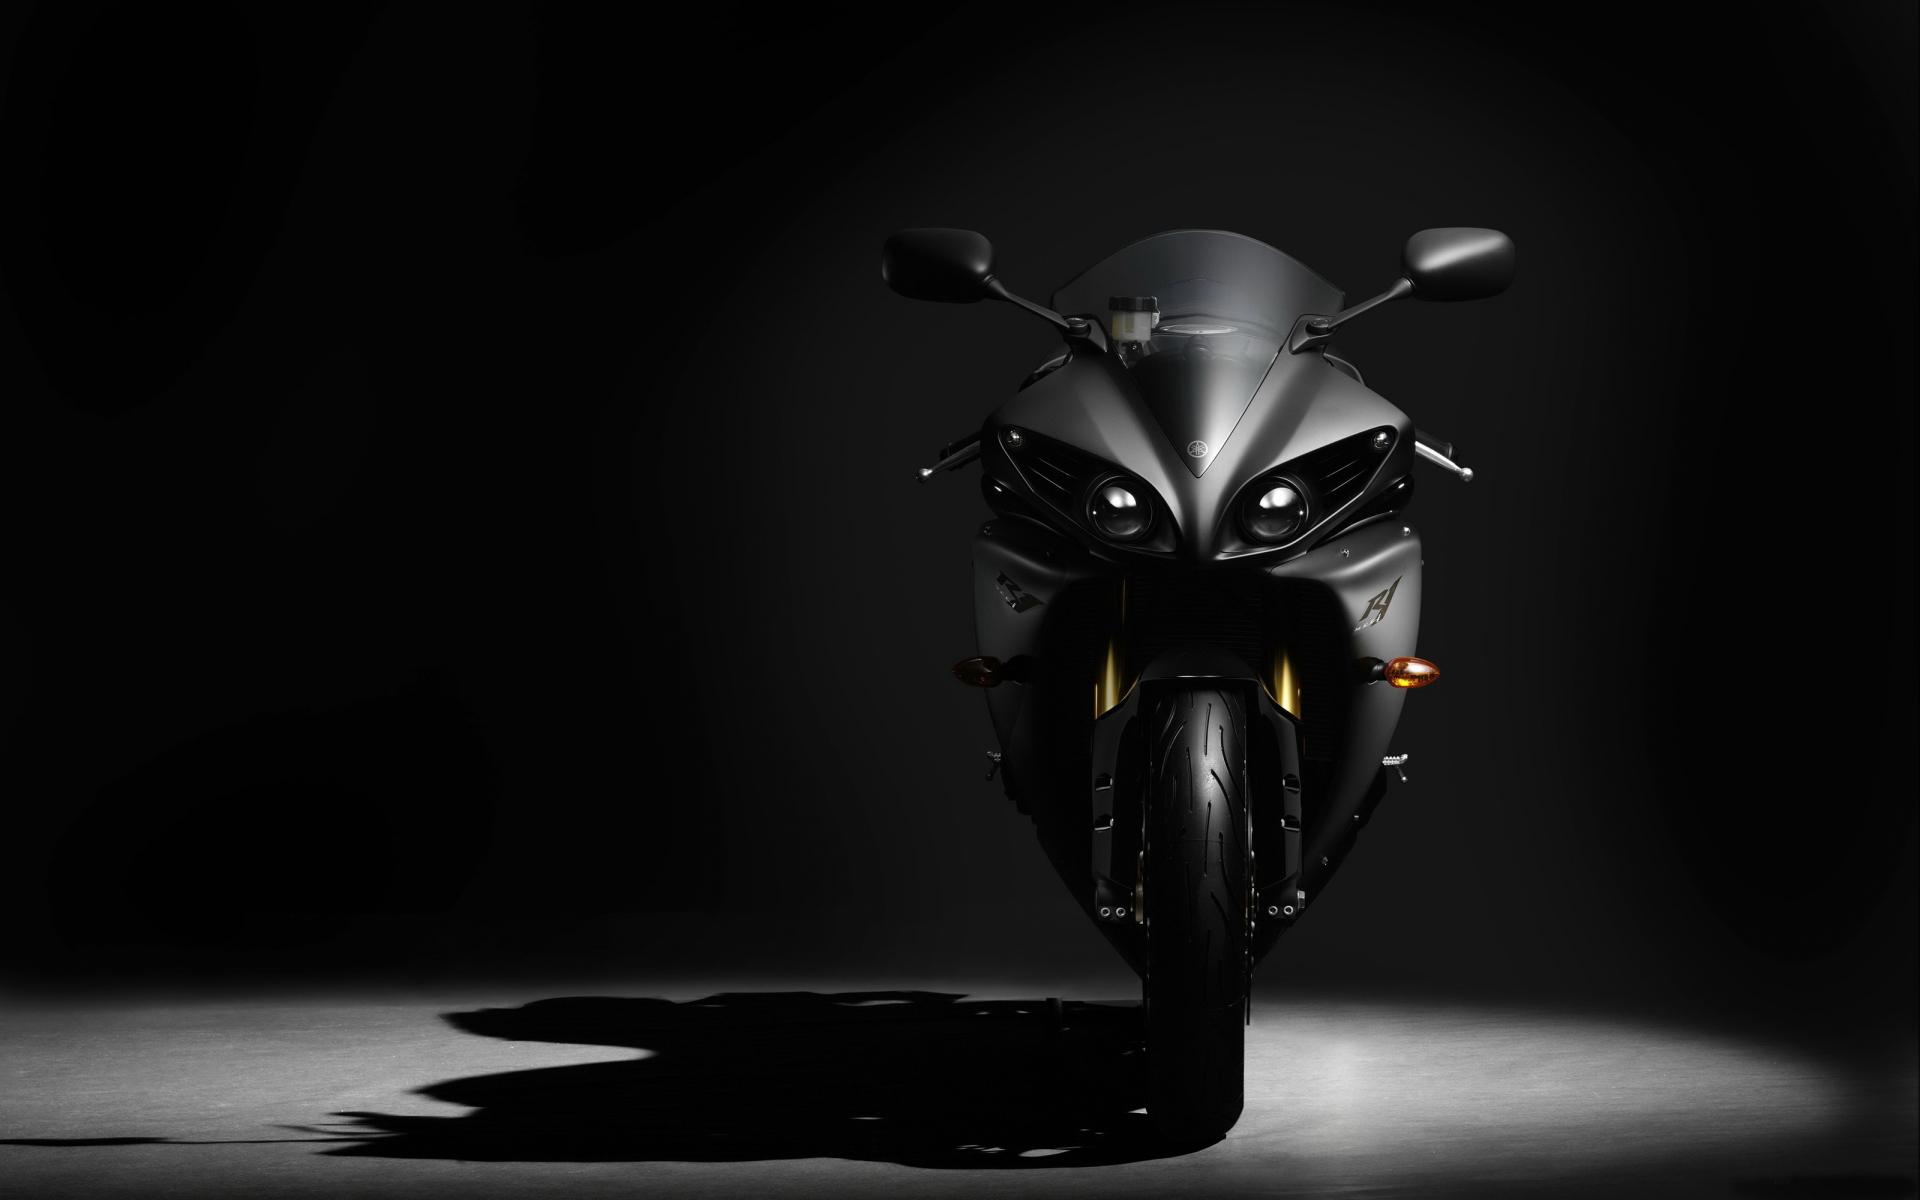 Amazing Black Bike Wallpaper